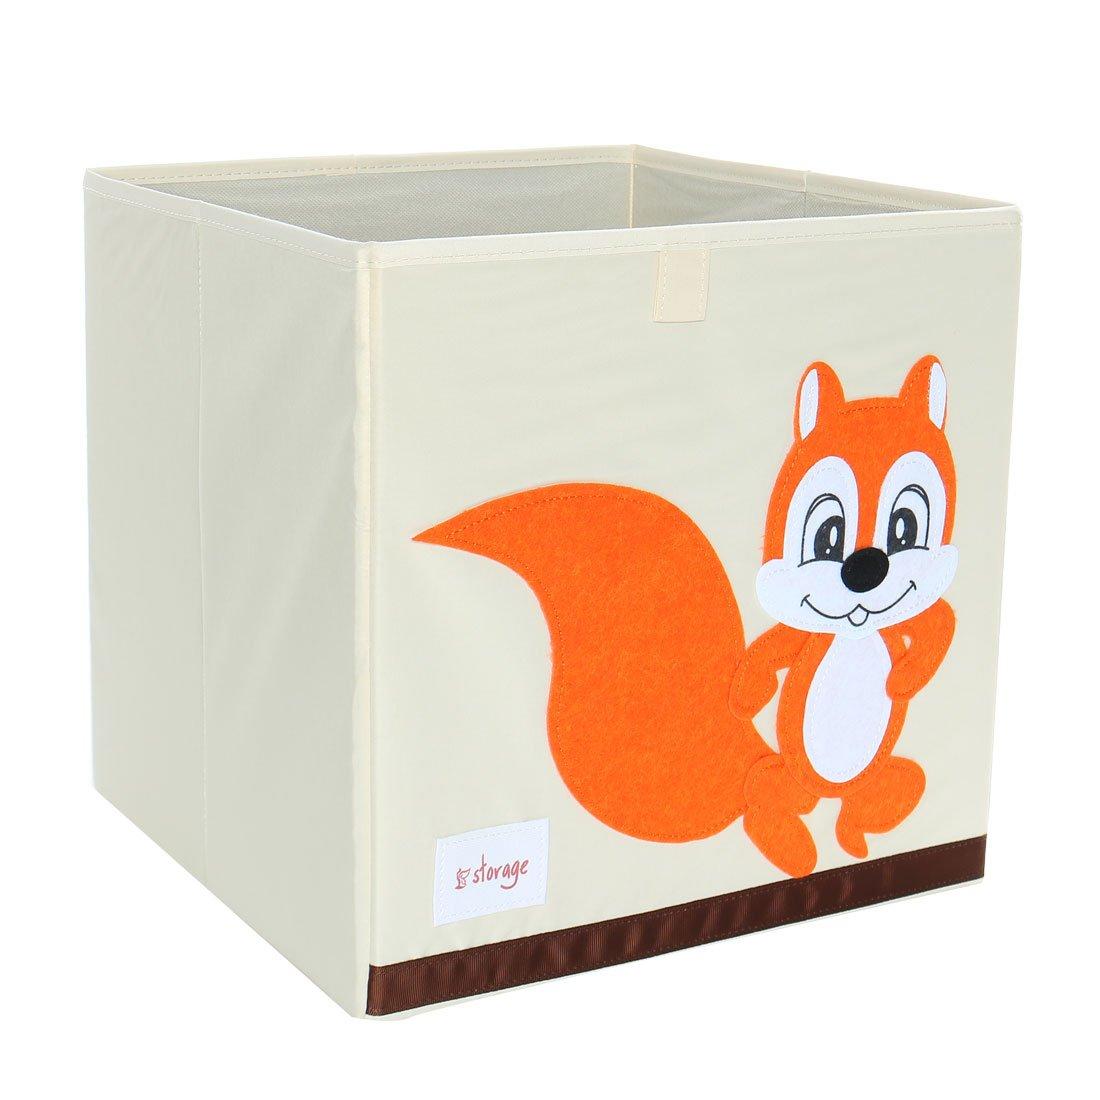 PiccoCasa Foldable Toy Storage Bins Square Cartoon Animal Storage Box Eco-Friendly Fabric Storage Cubes Organizer for Bedroom Playroom Orange Squirrel No Lid 13''x13''x13''